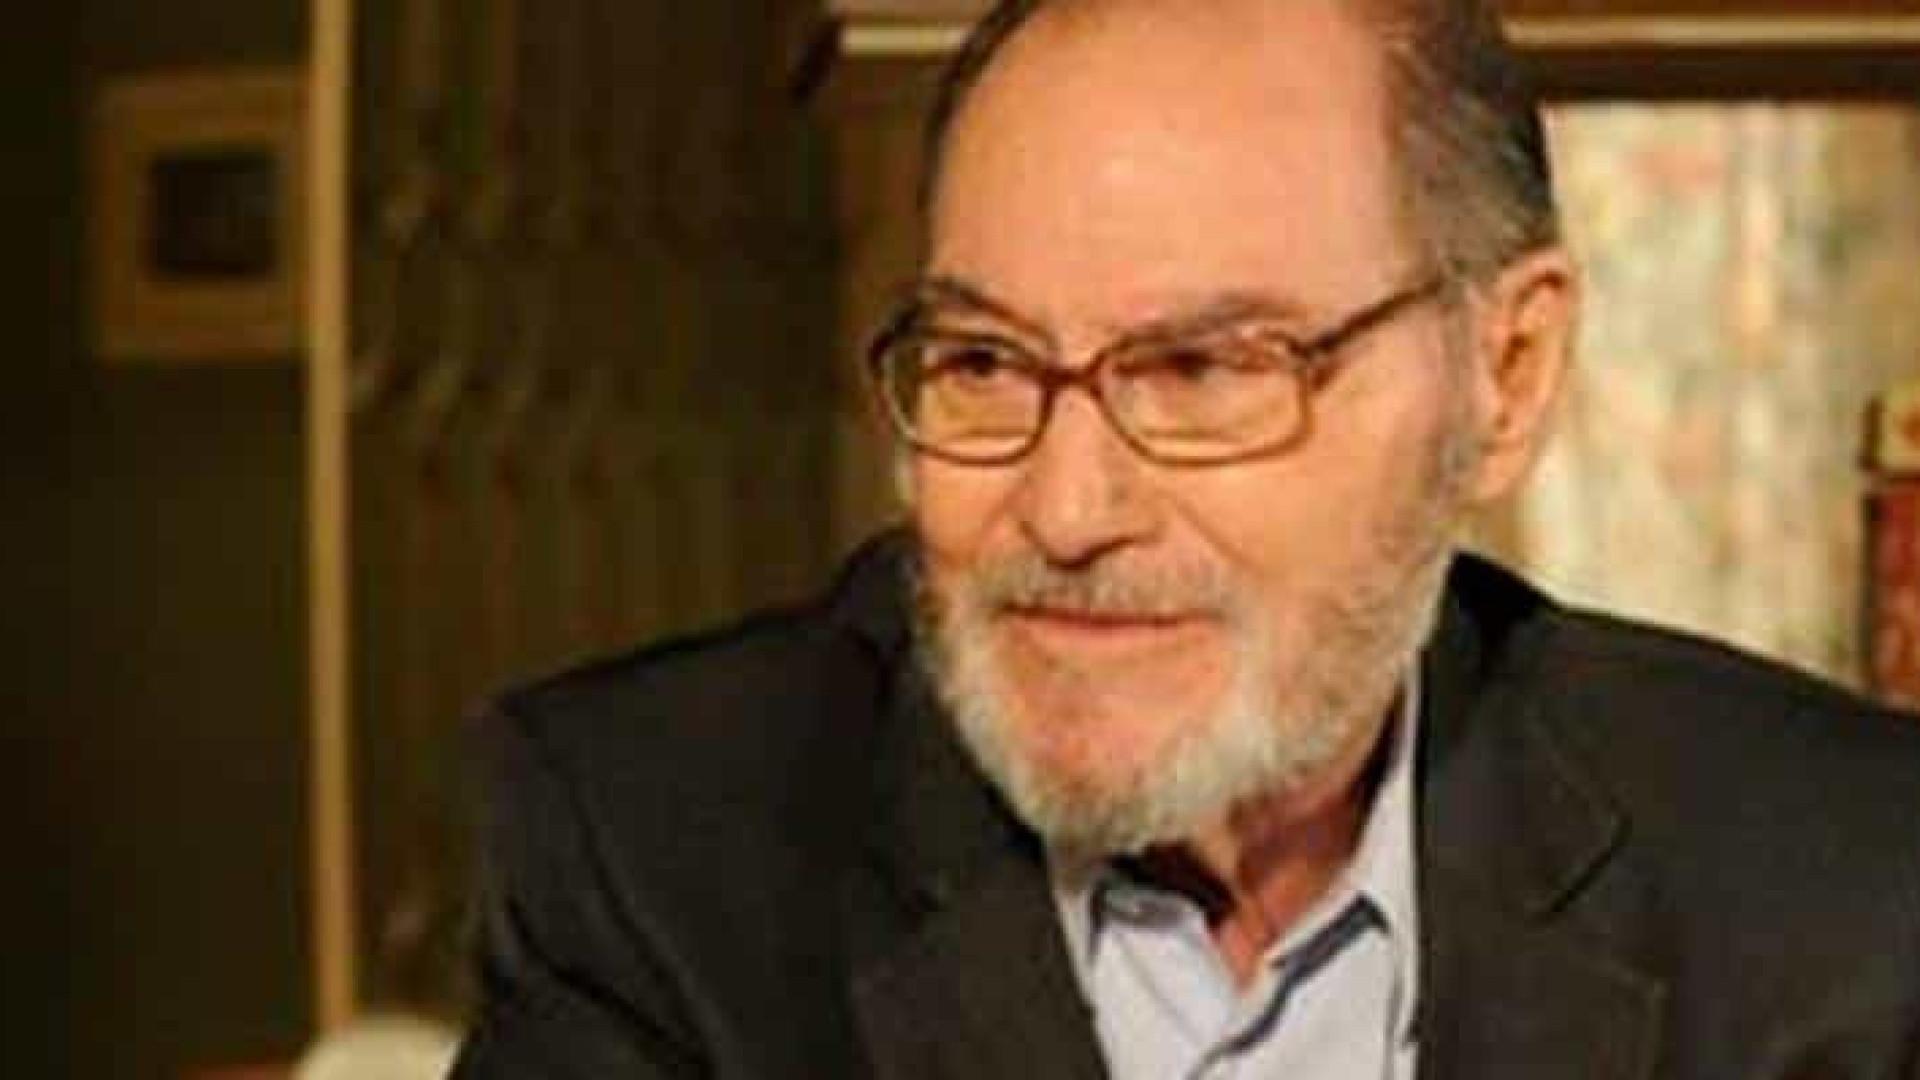 Morre Leonardo Villar, ator de novelas que eternizou Zé do Burro